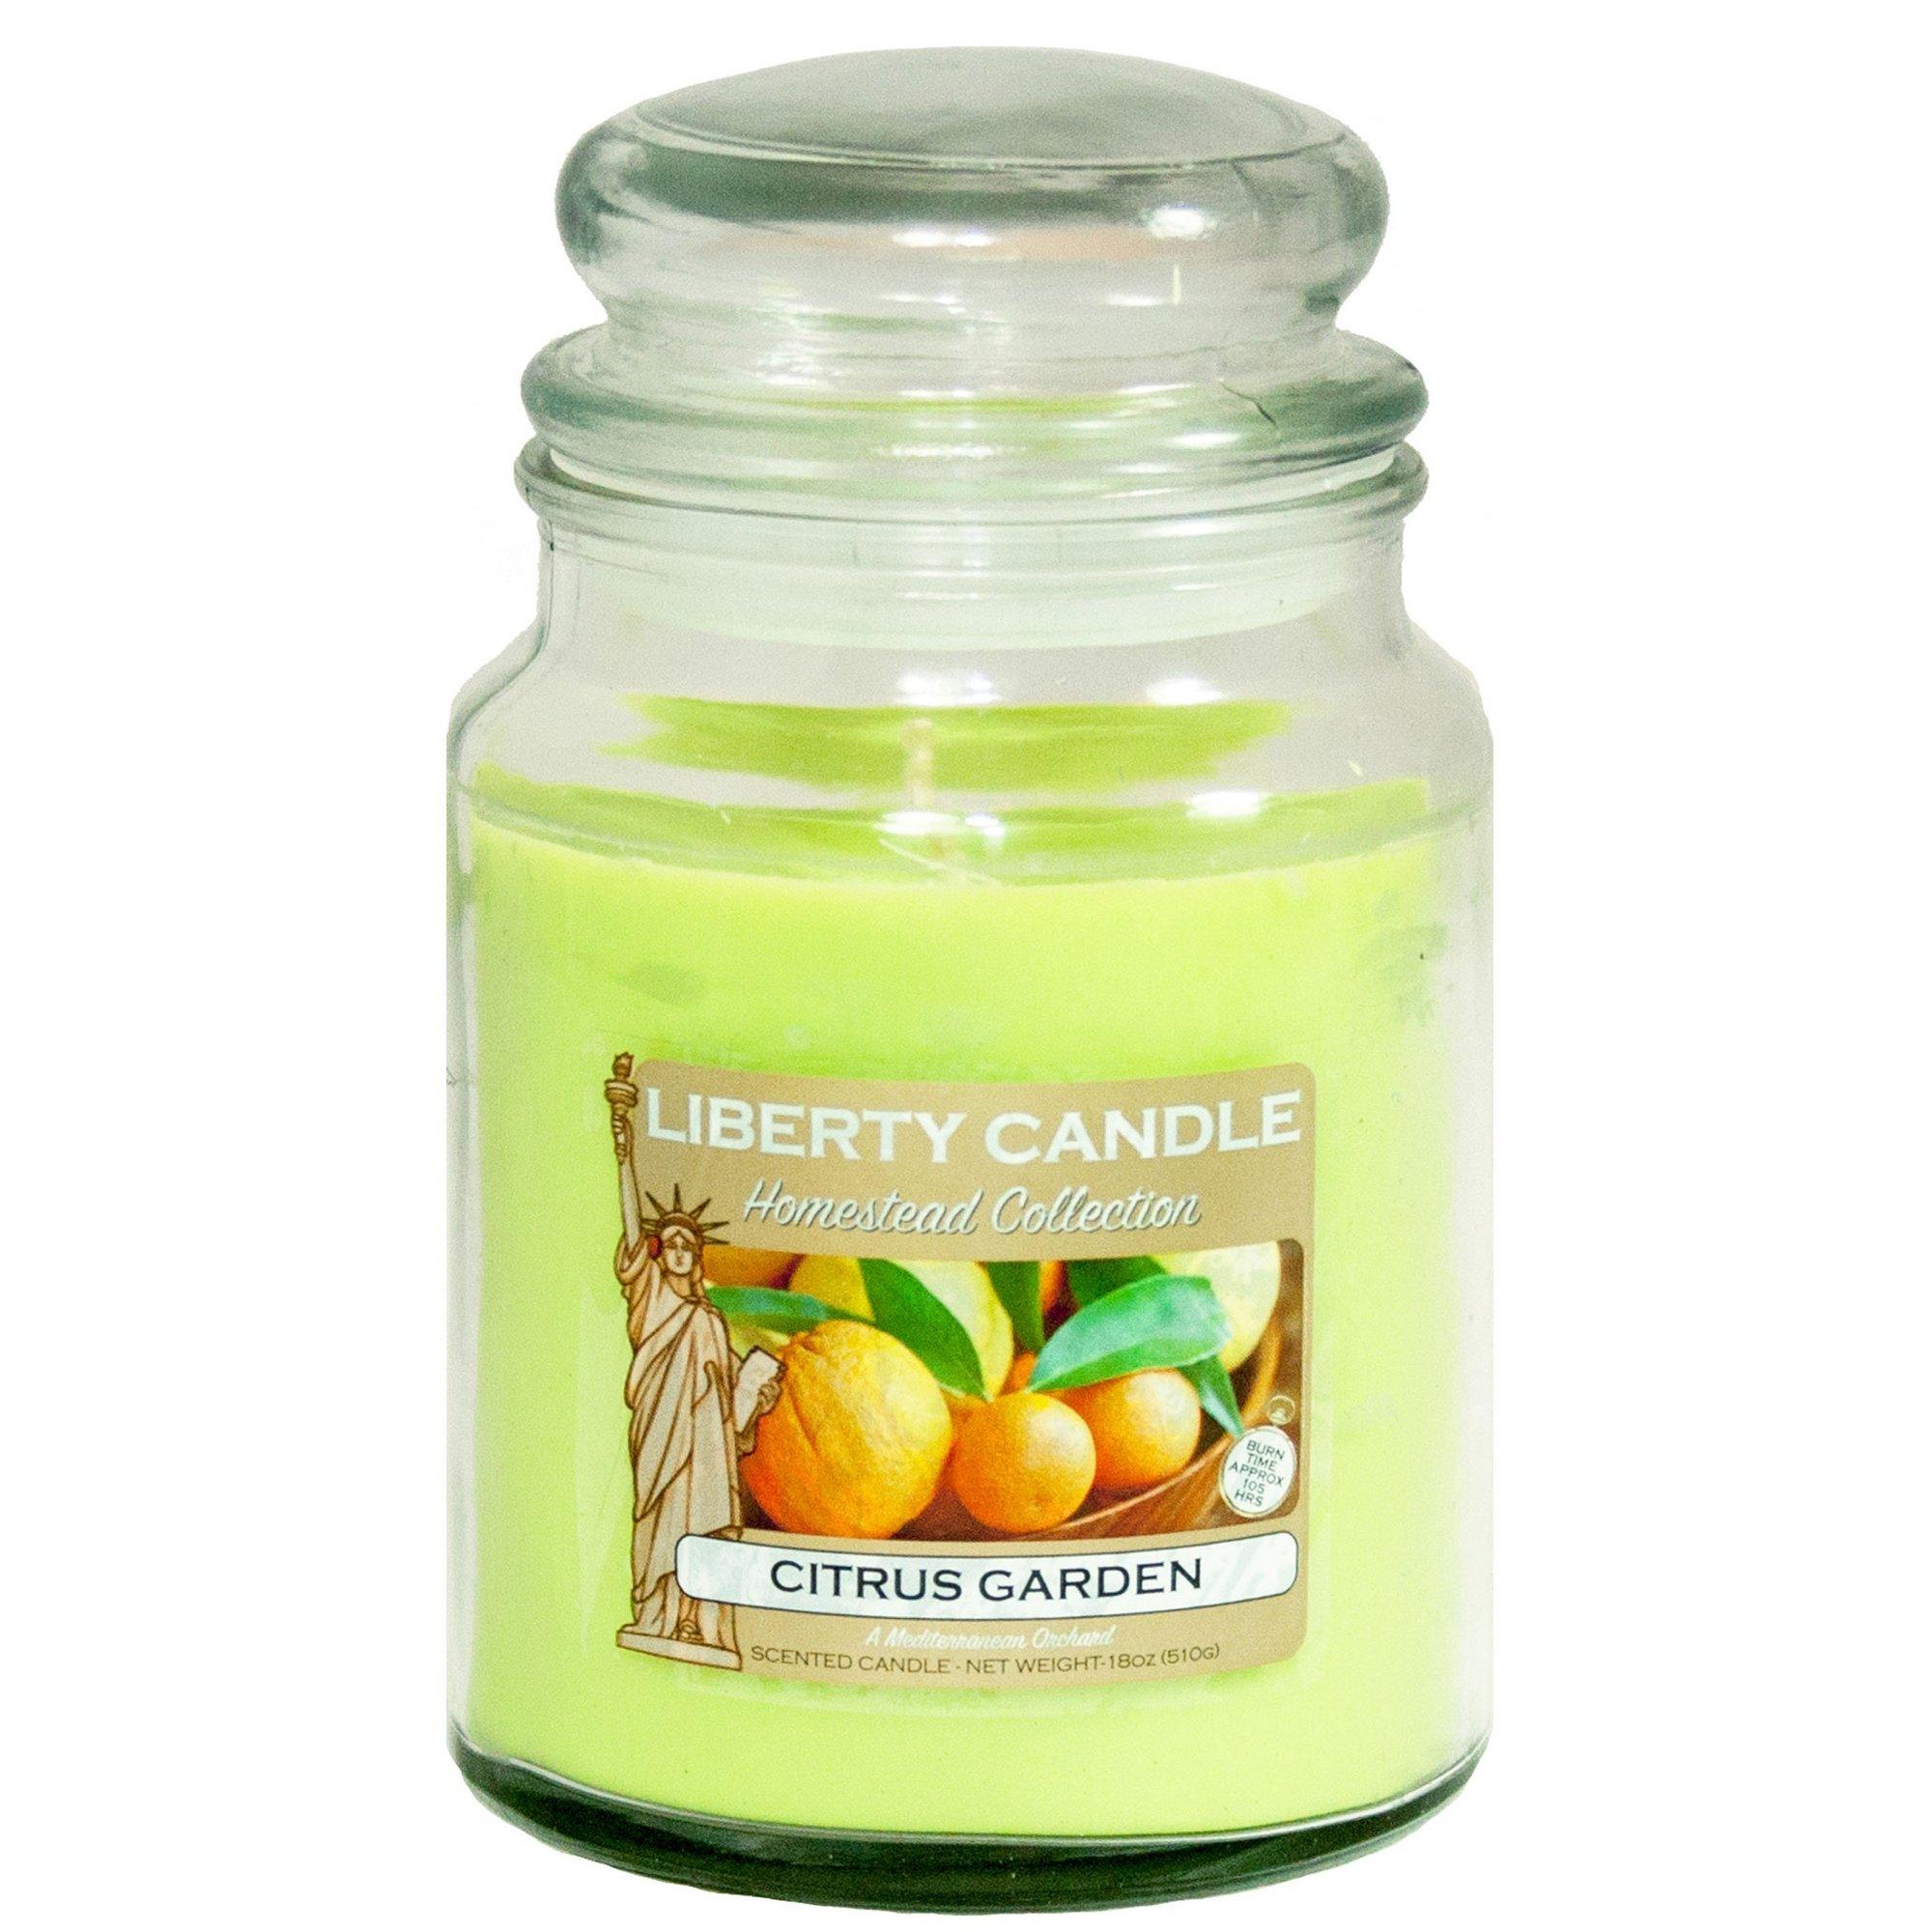 Image of 18oz Glass Jar Candle - Citrus Garden